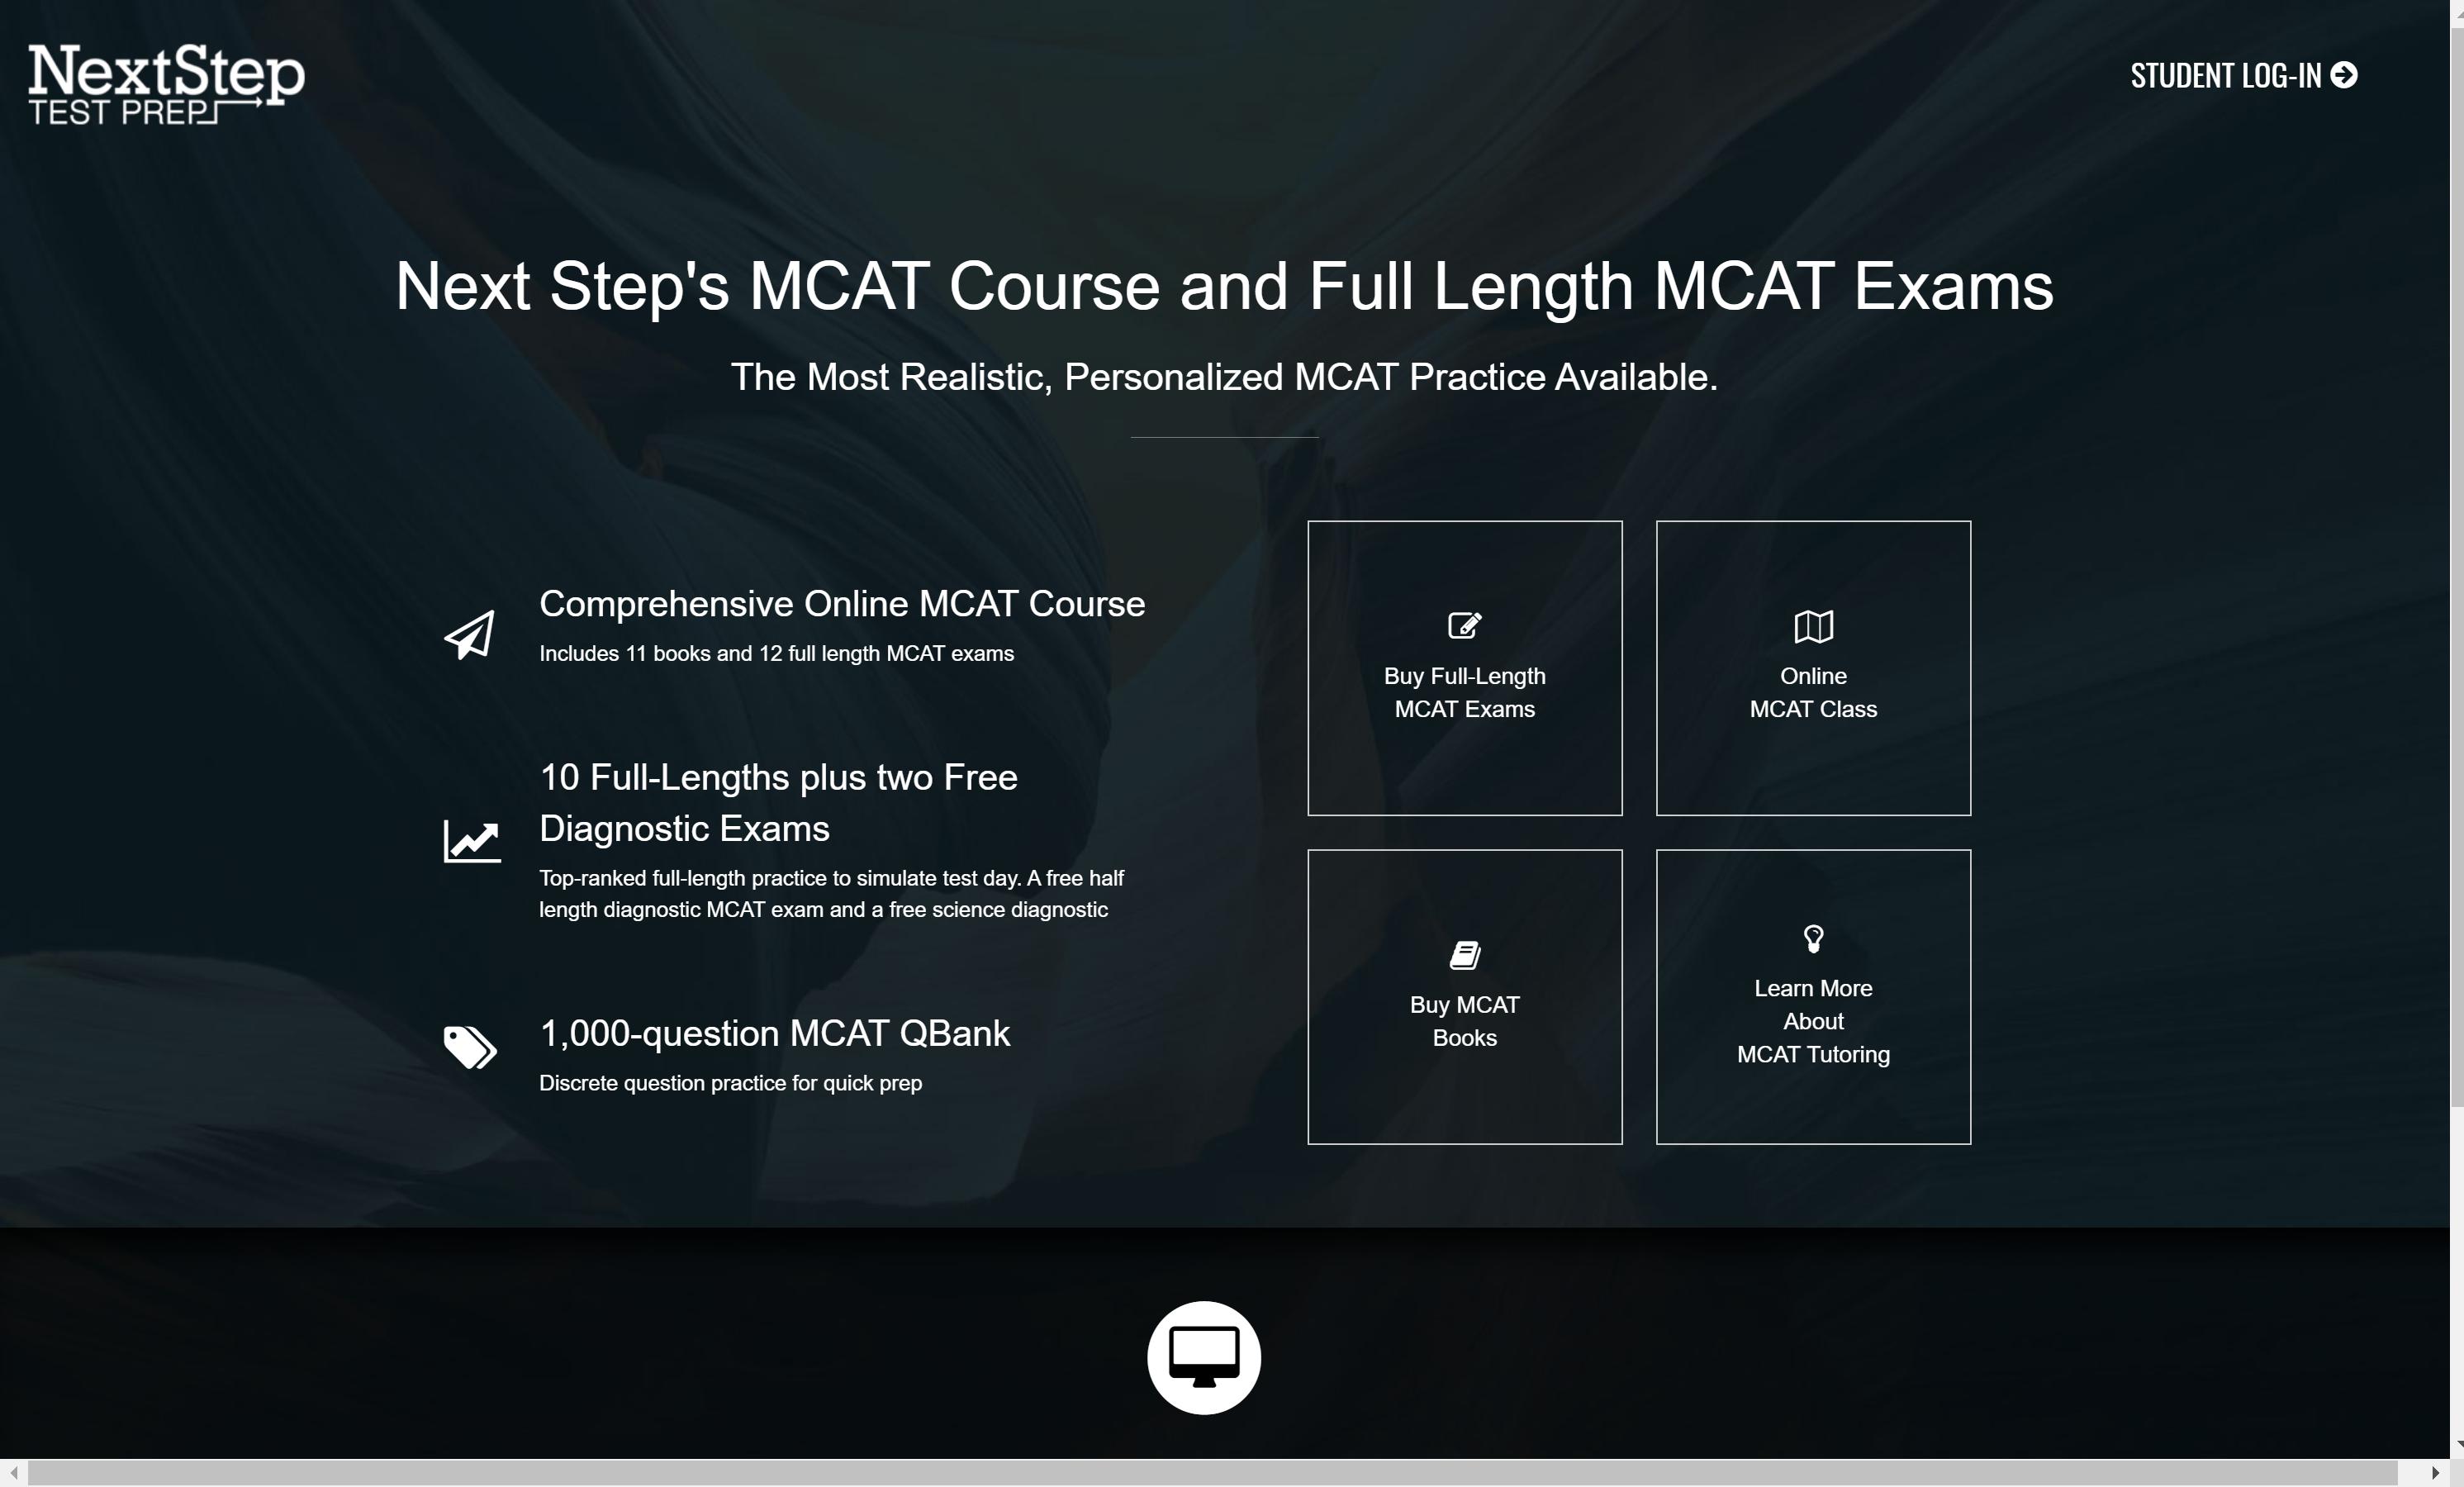 NextStep MCAT Online Courses